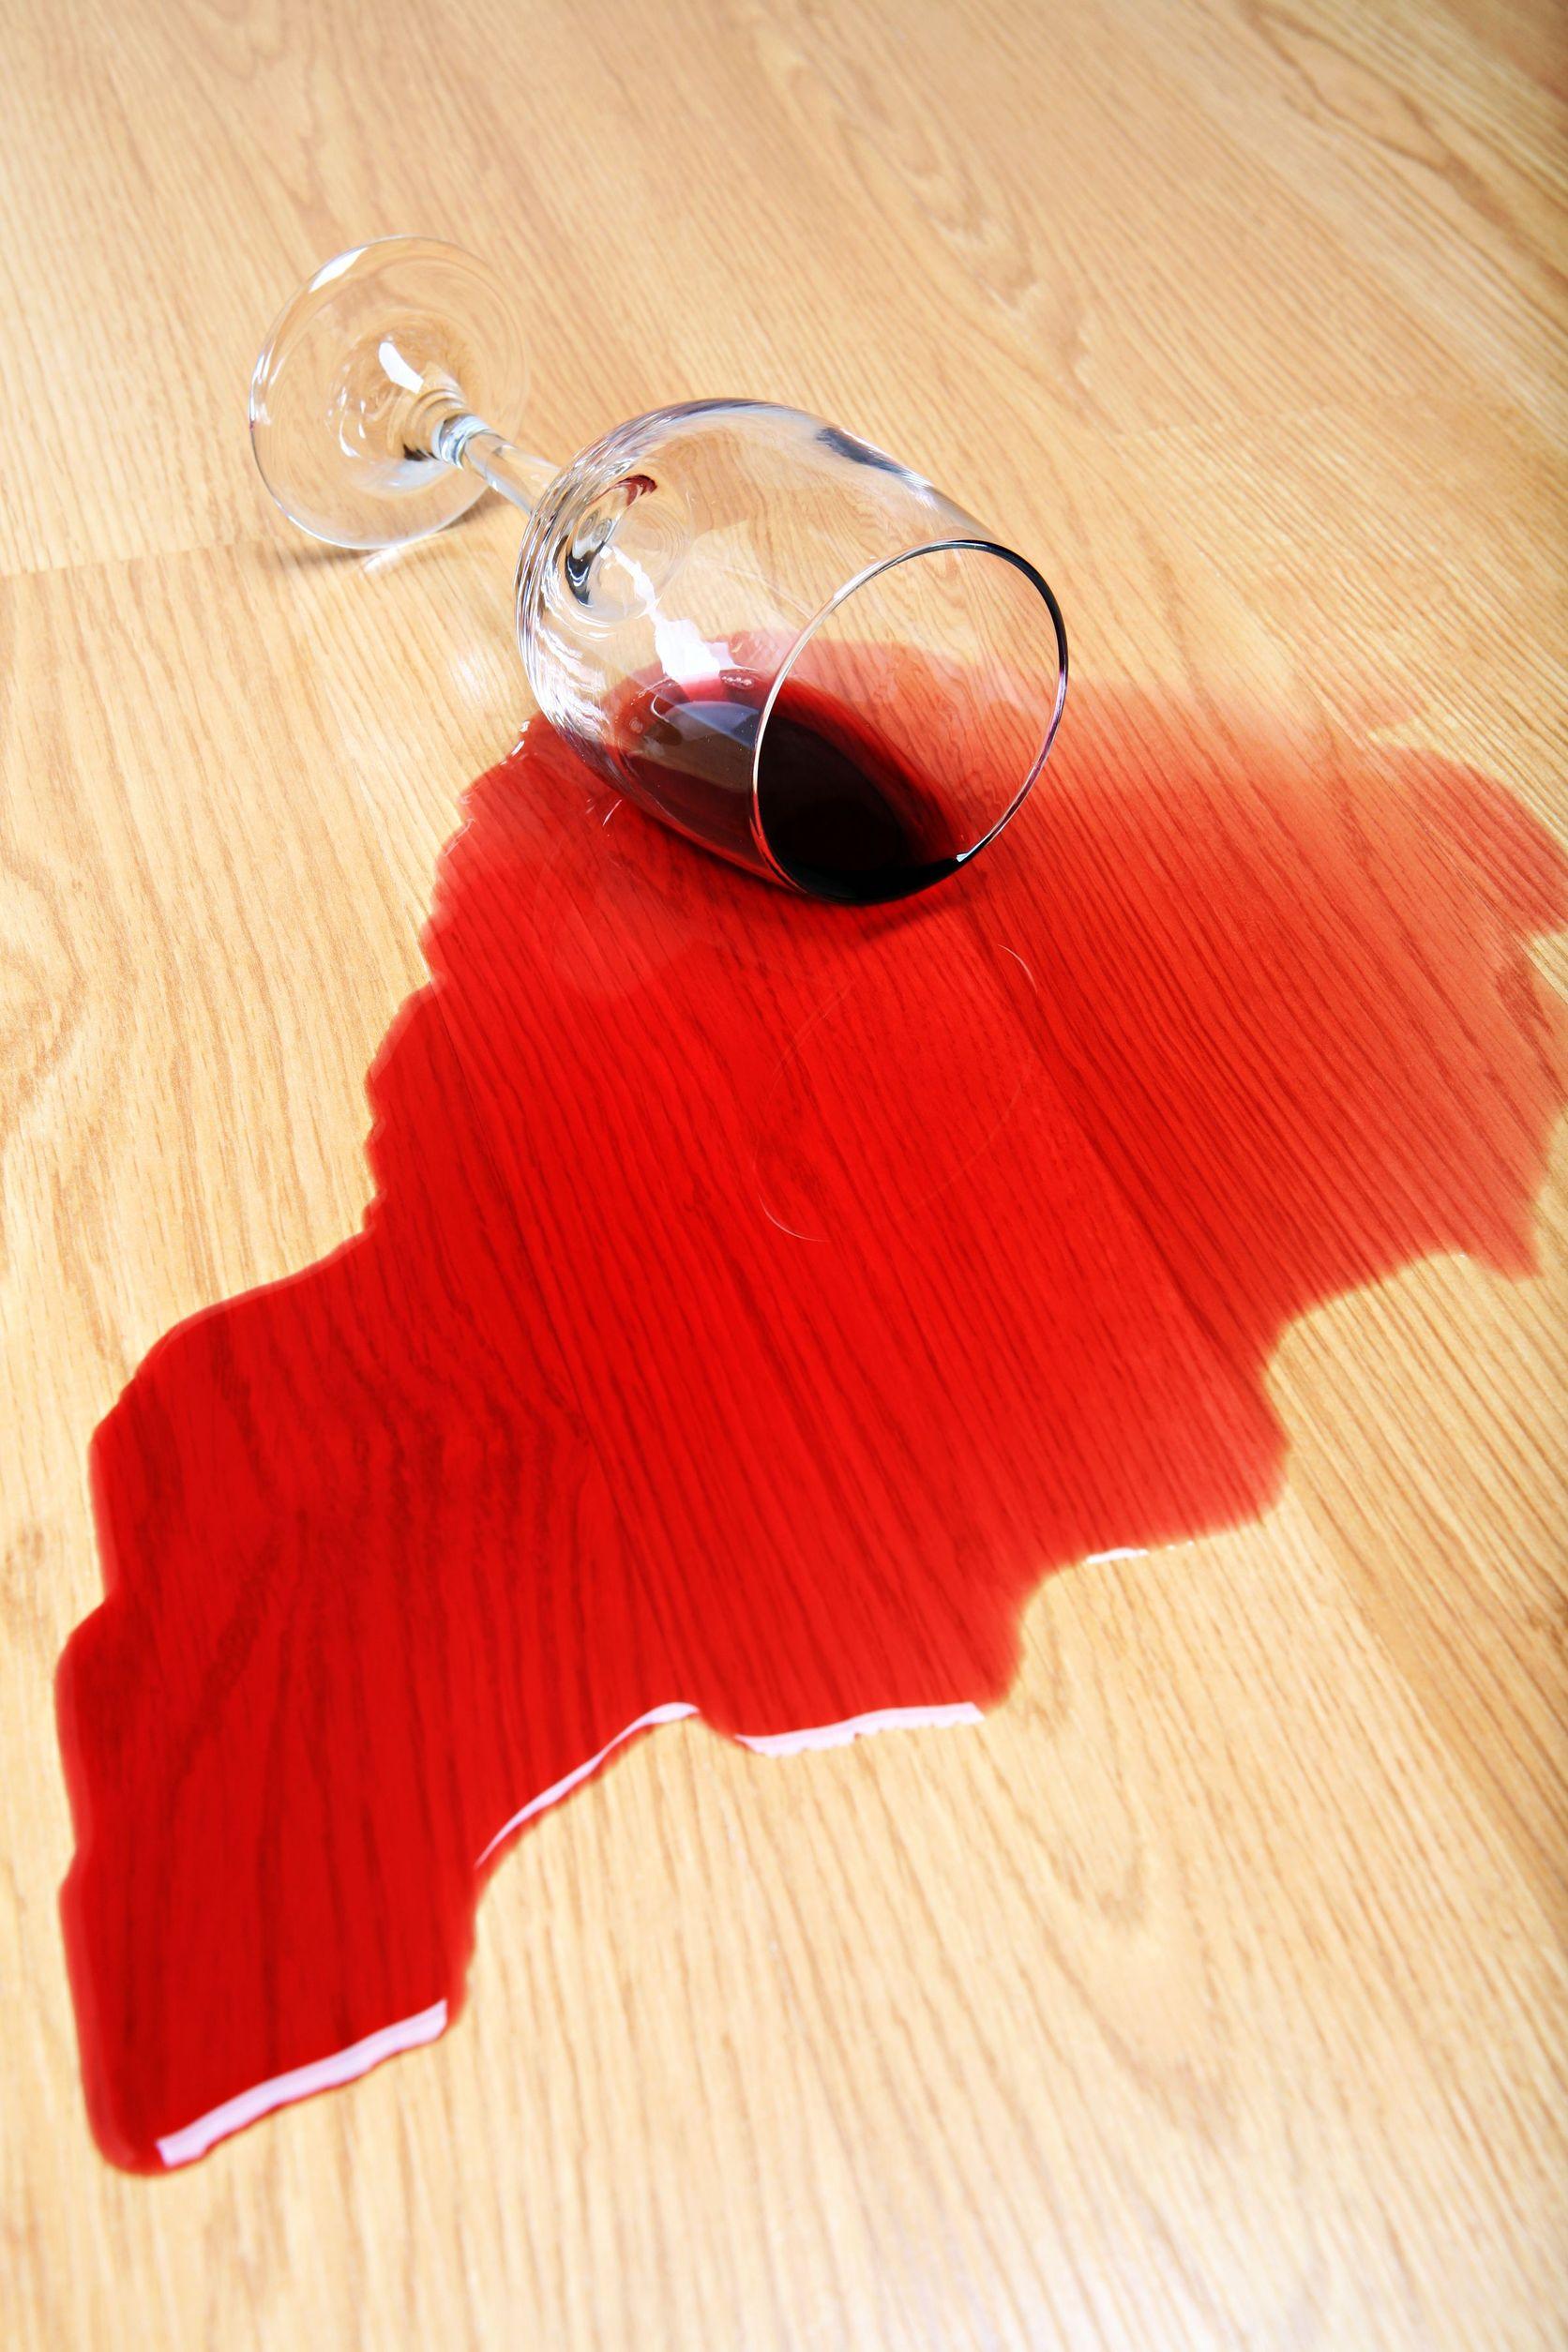 3900518 Wine Spilled On Hardwood Floor Red Wine Glass